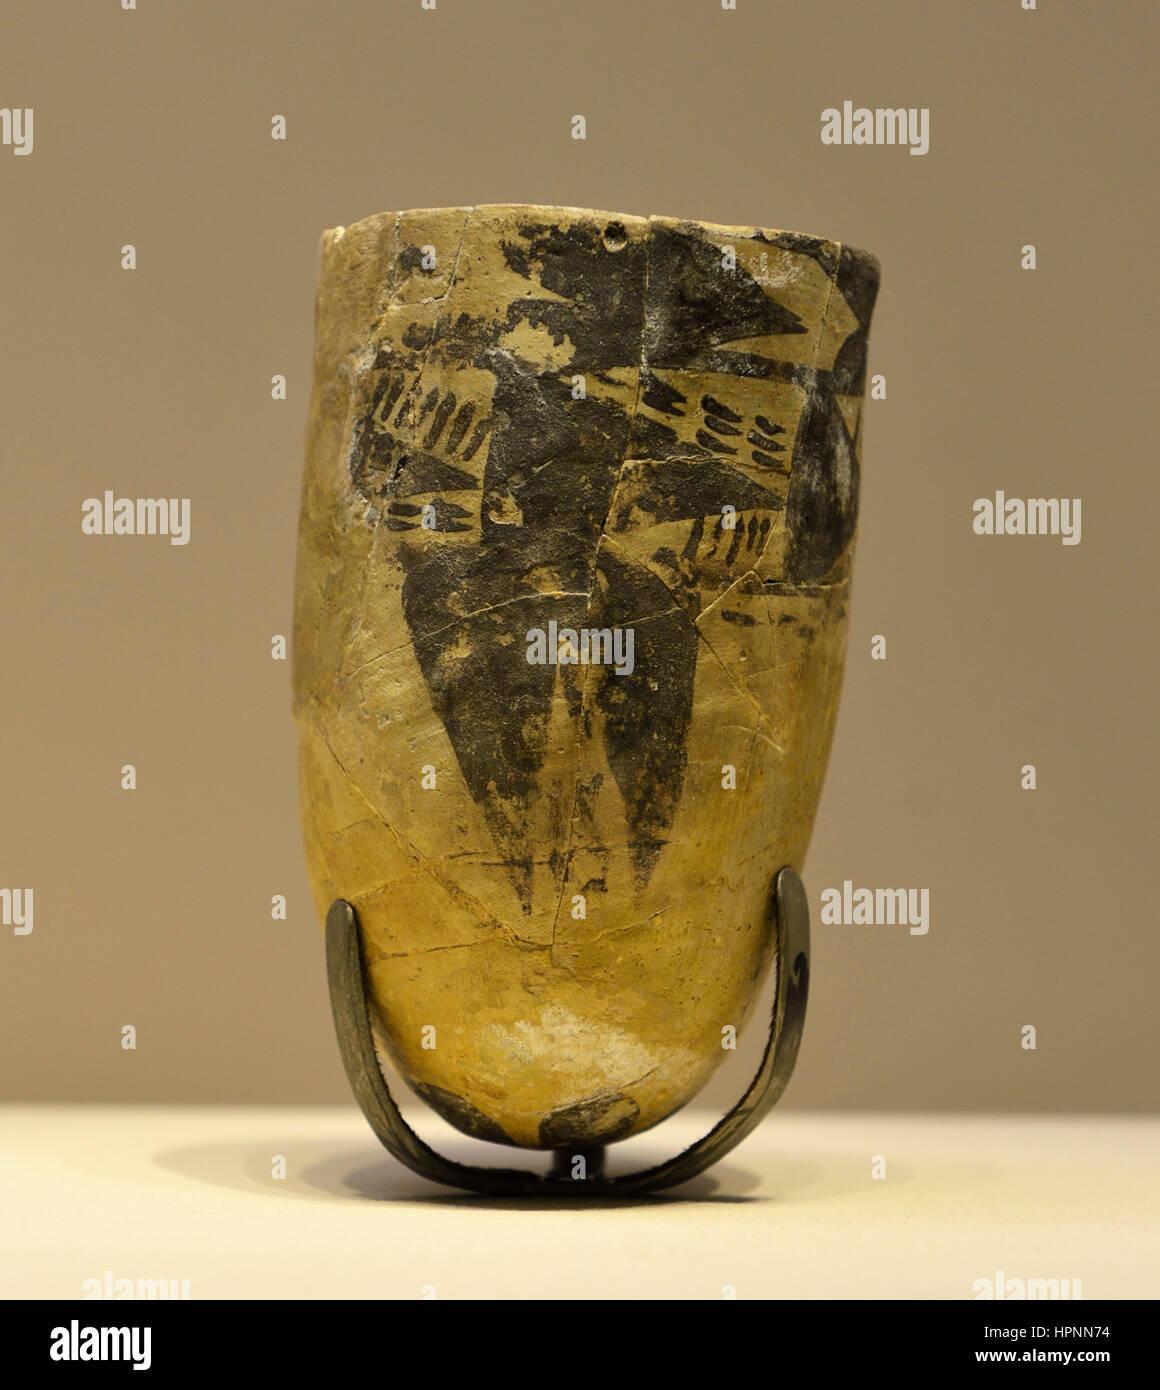 Beaker. Khursaniyah. Ubaid III, around 5300-4700 BCE. Painted earthenware. National Museum, Riyadh. - Stock Image